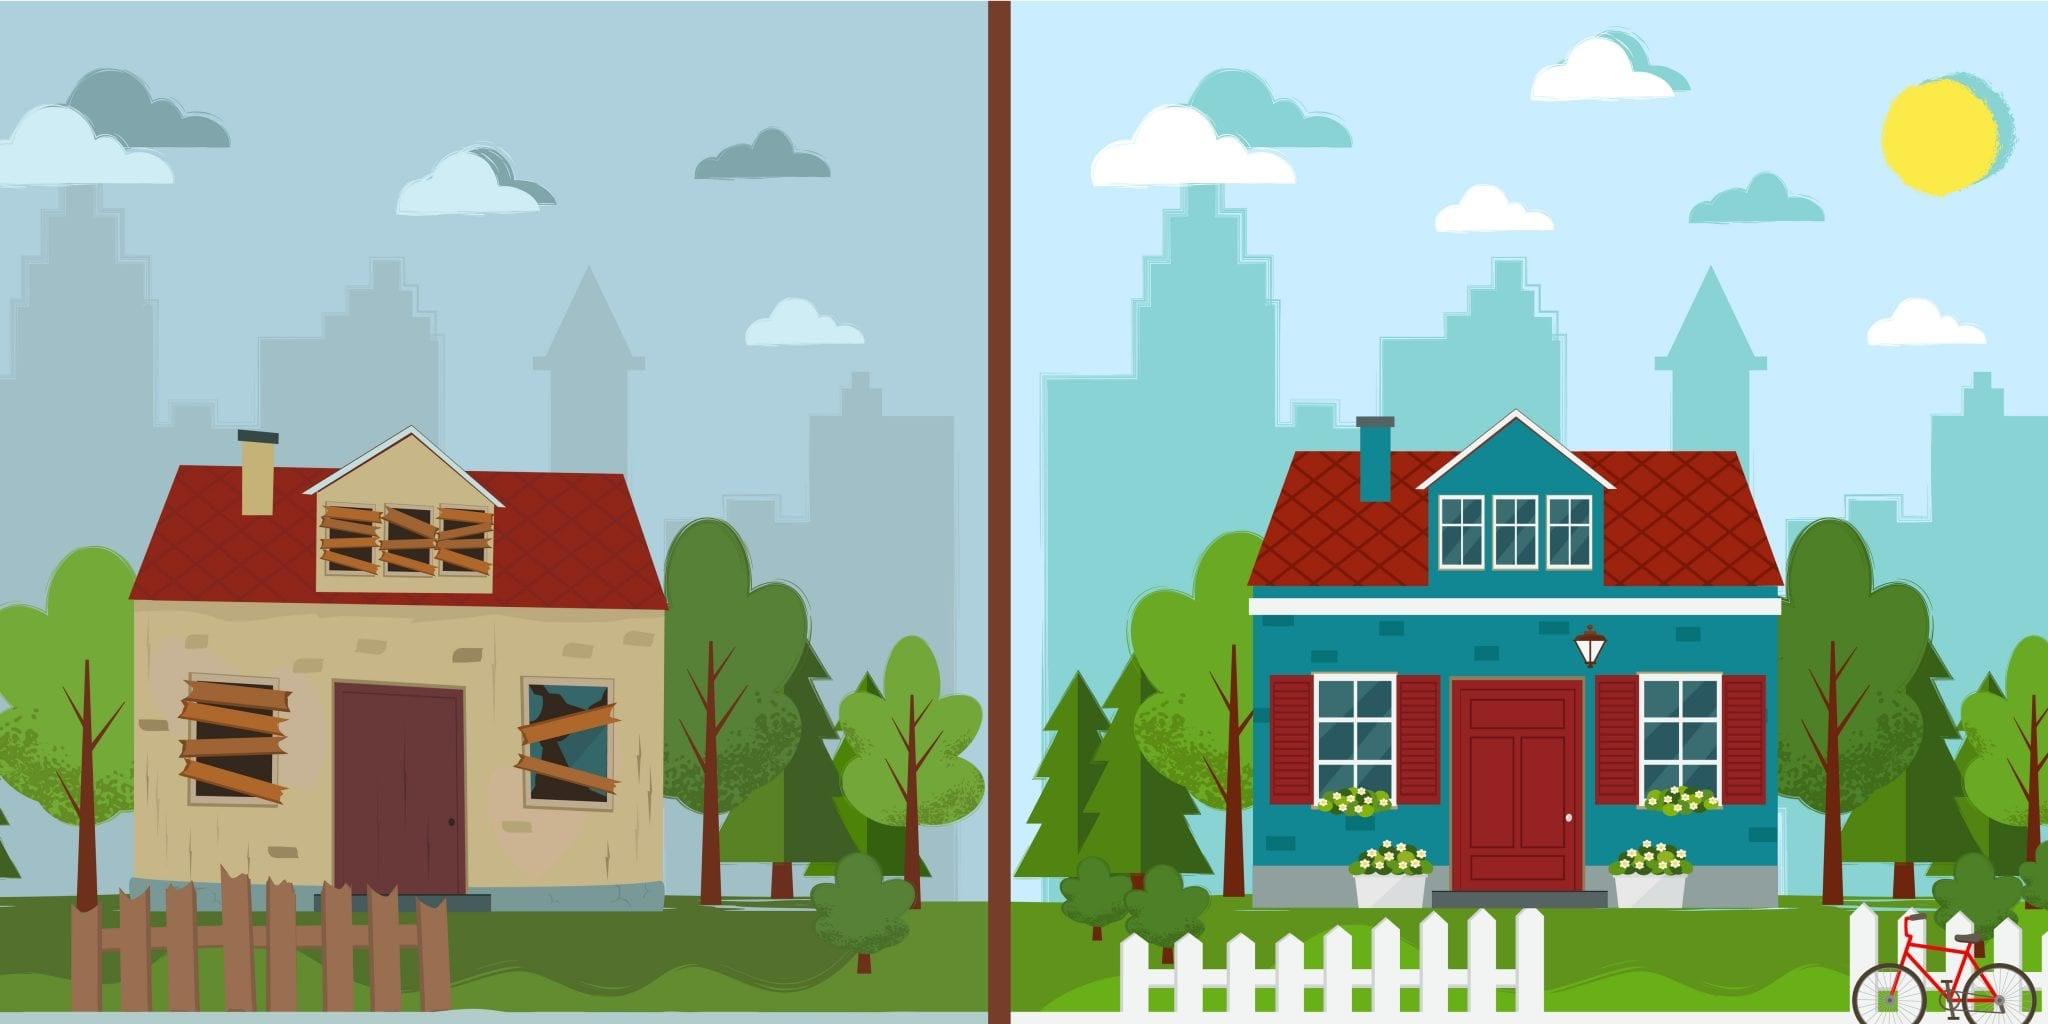 1-2-3 Flip: How To Flip Houses The Profitable Way